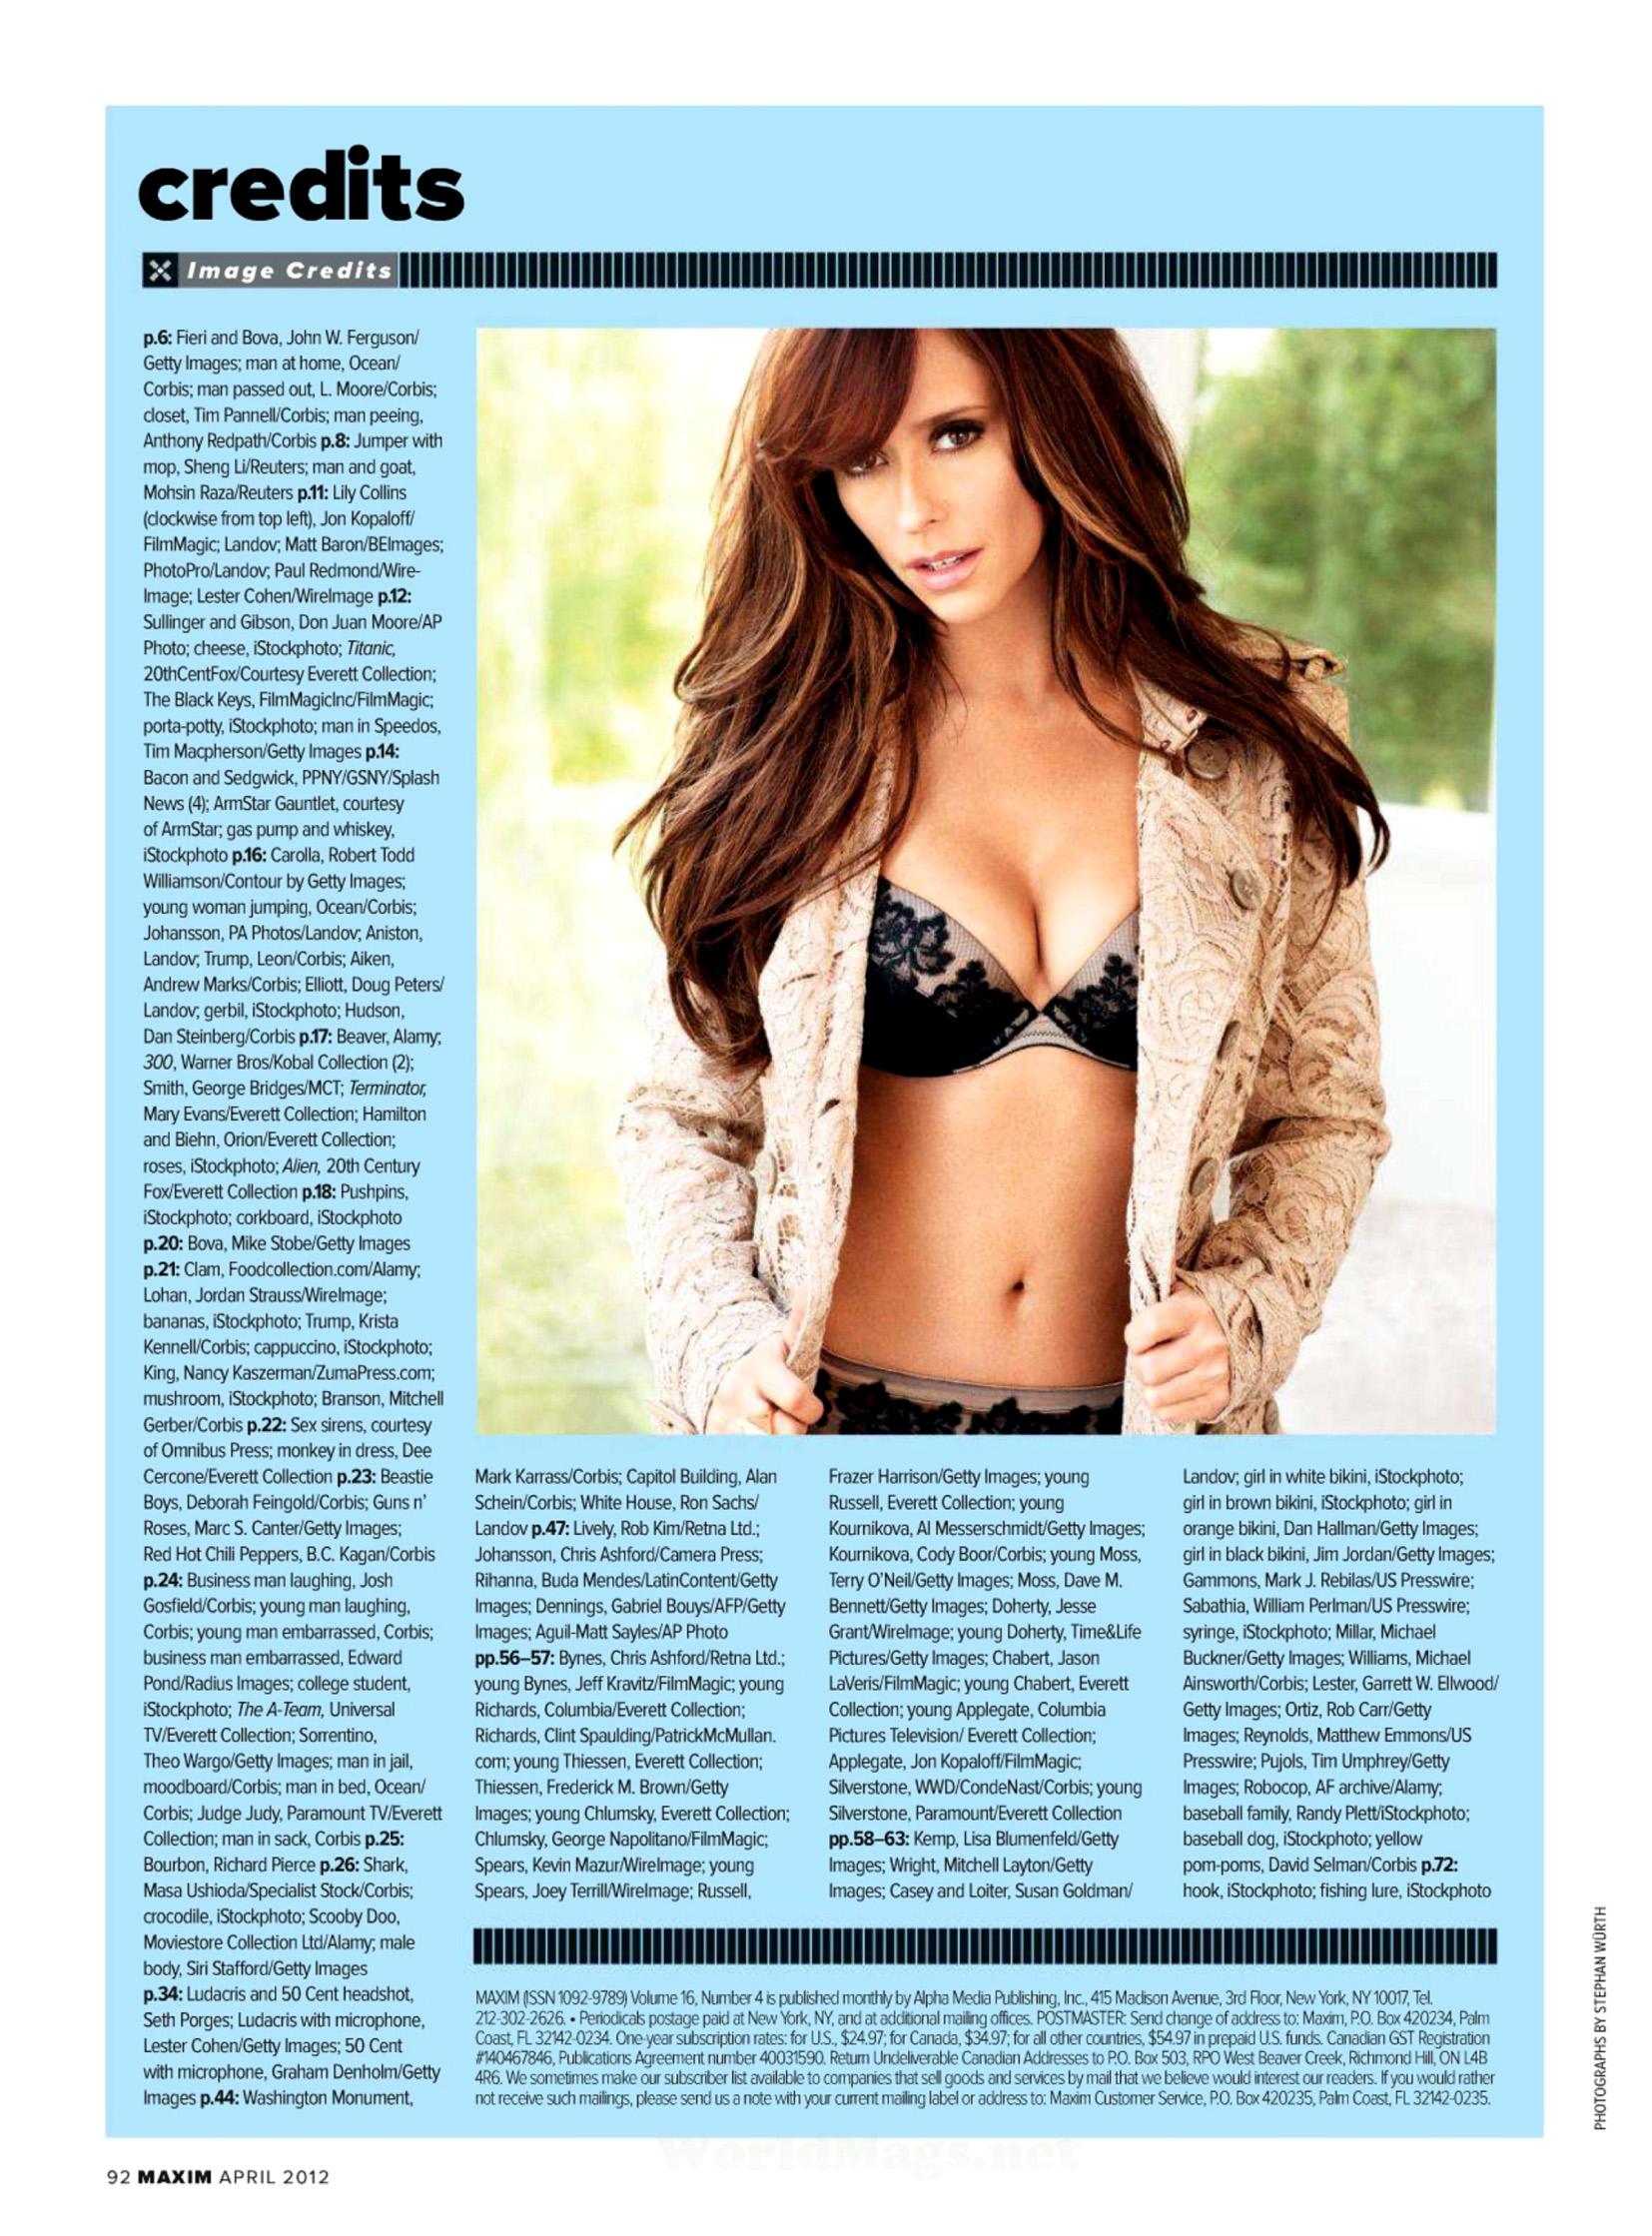 Jennifer Love Hewitt 2013 : Jennifer Love Hewitt – Maxim 2012 -13